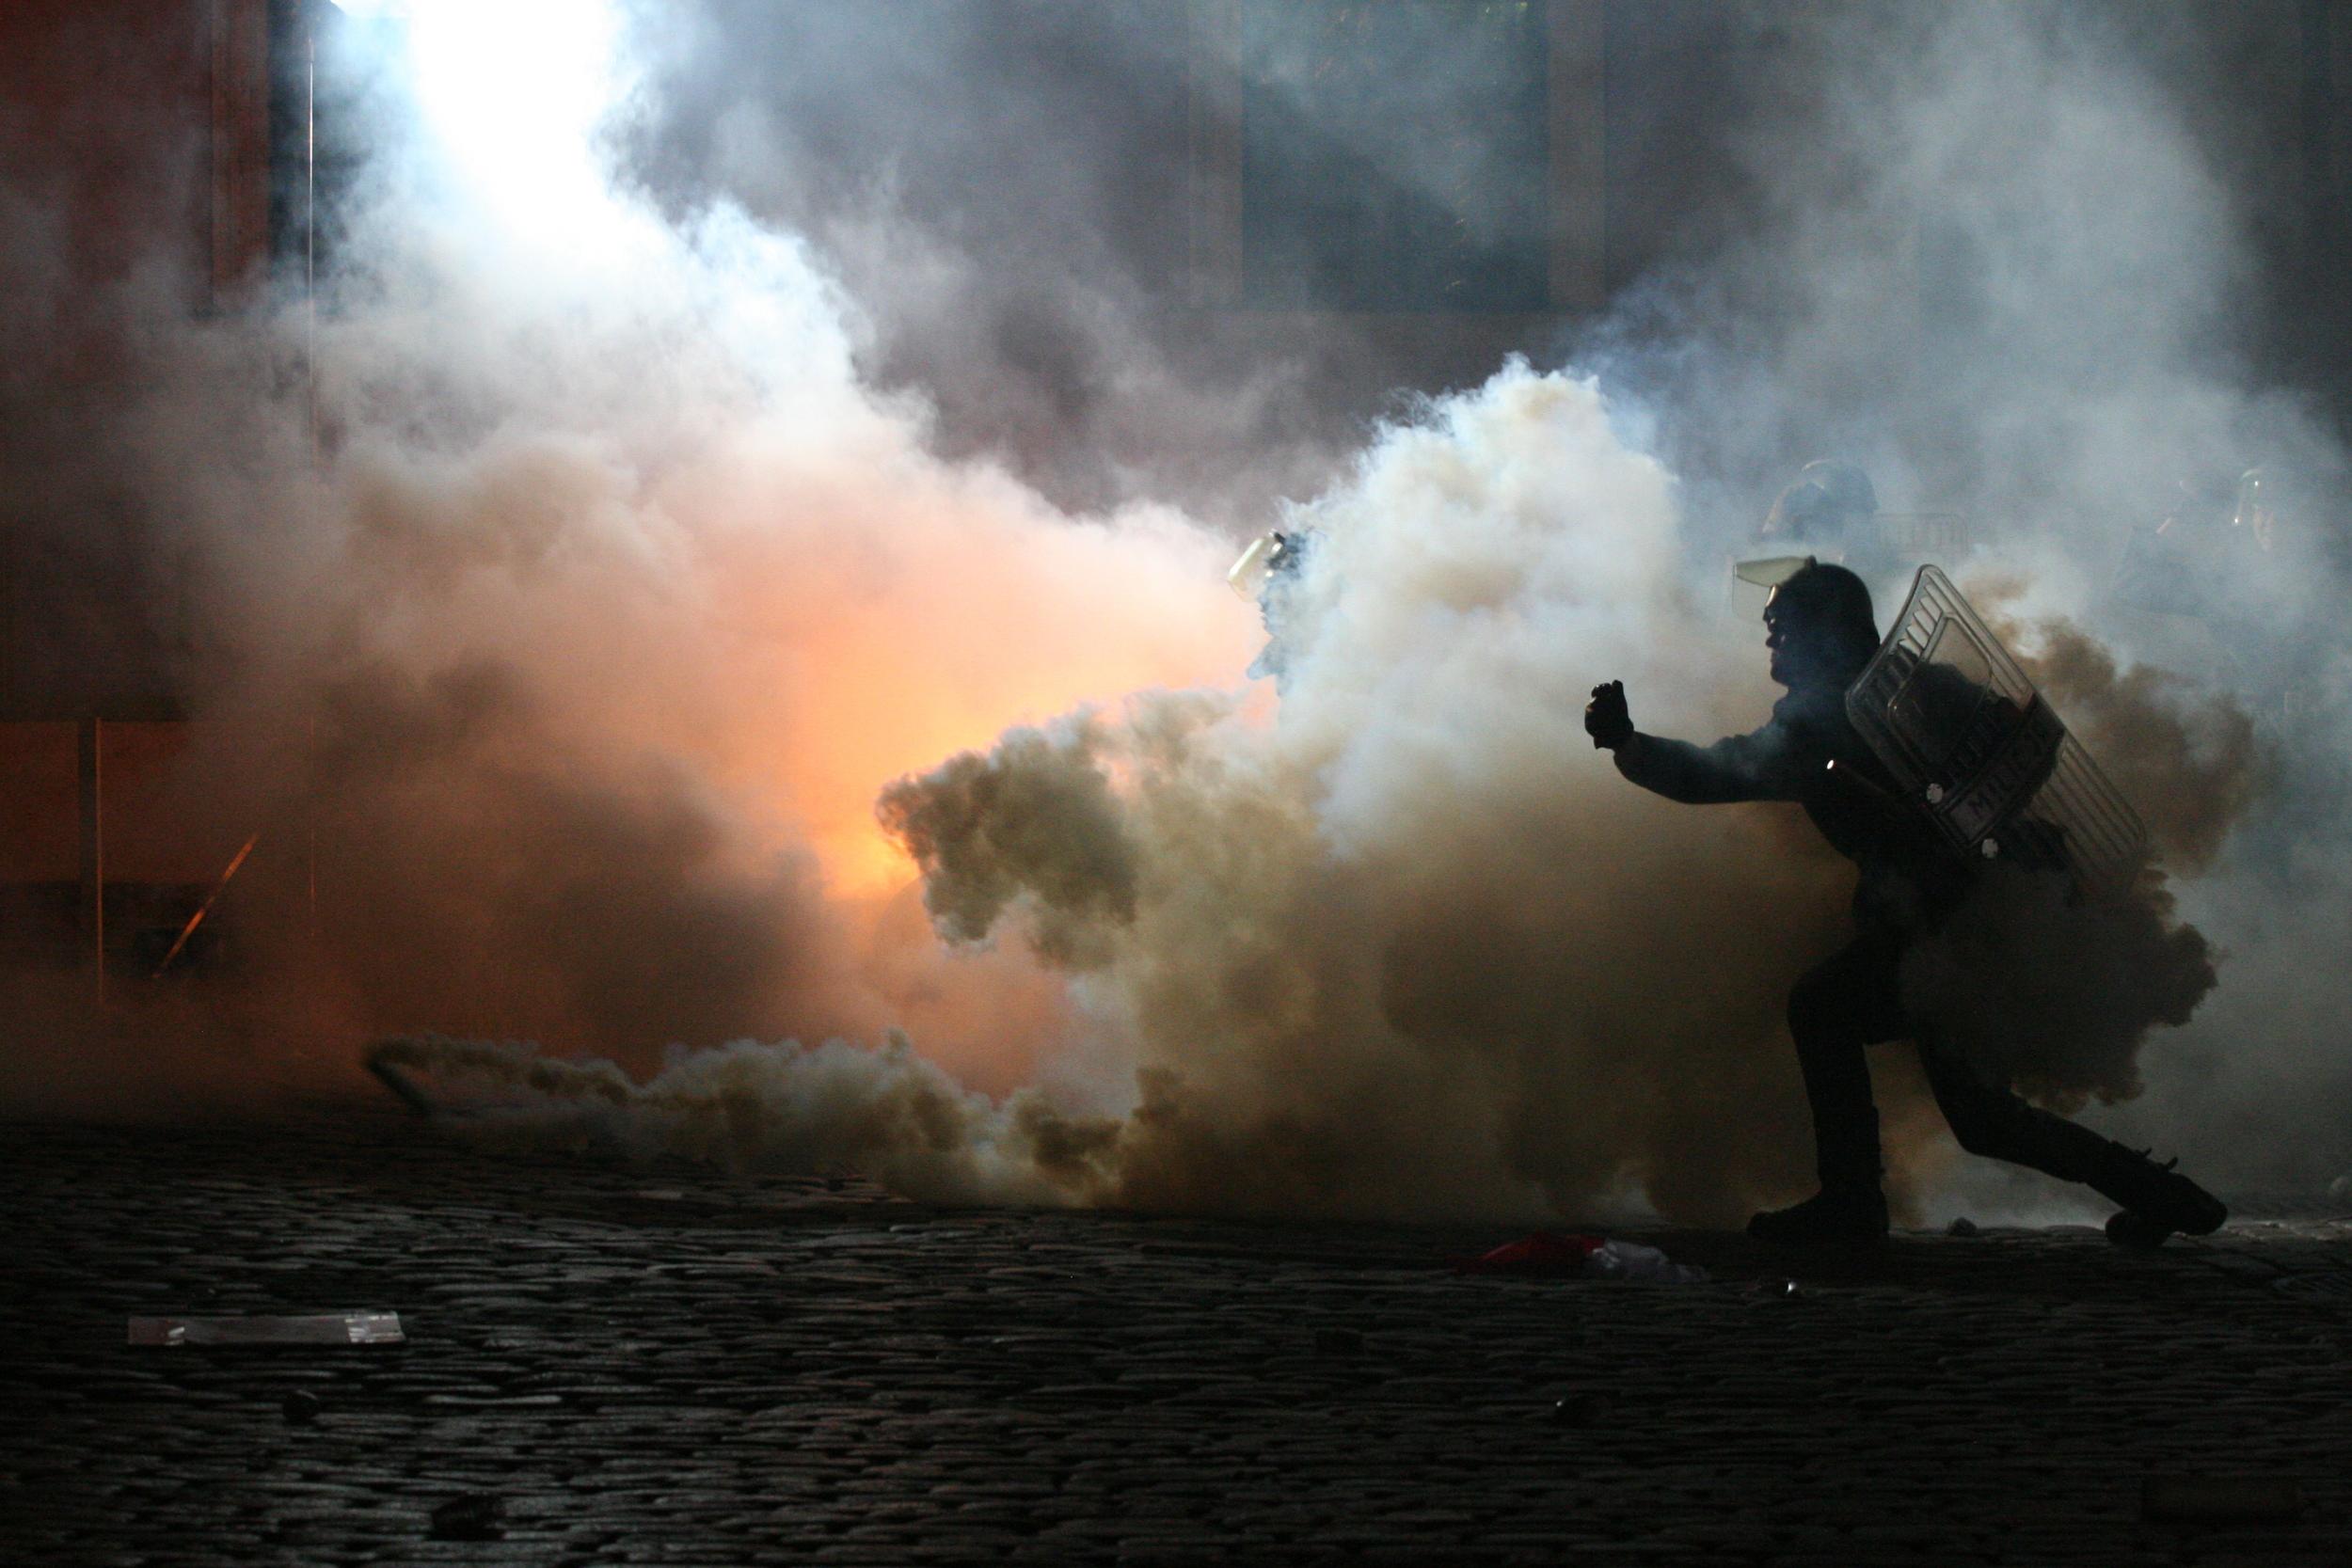 Swat team police running around in clouds of tear gas.